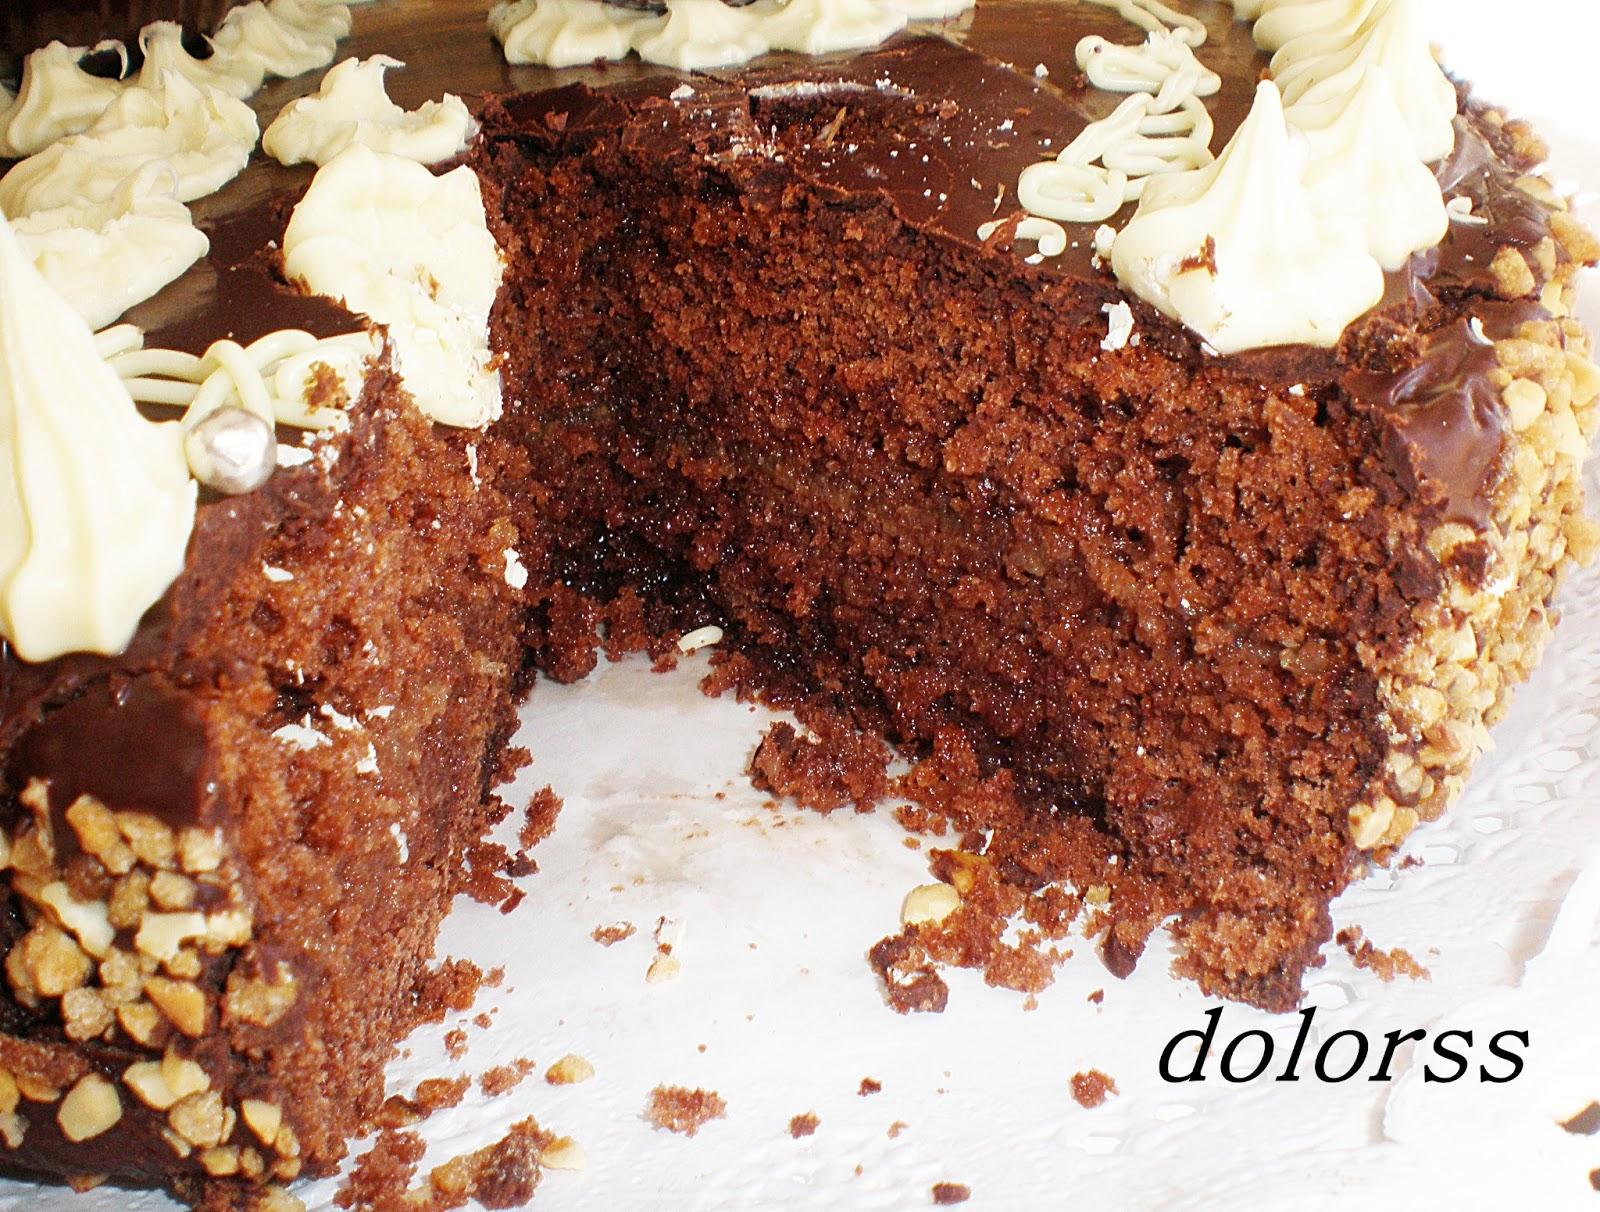 Blog de cuina de la dolorss: Mona de Pascua de chocolate